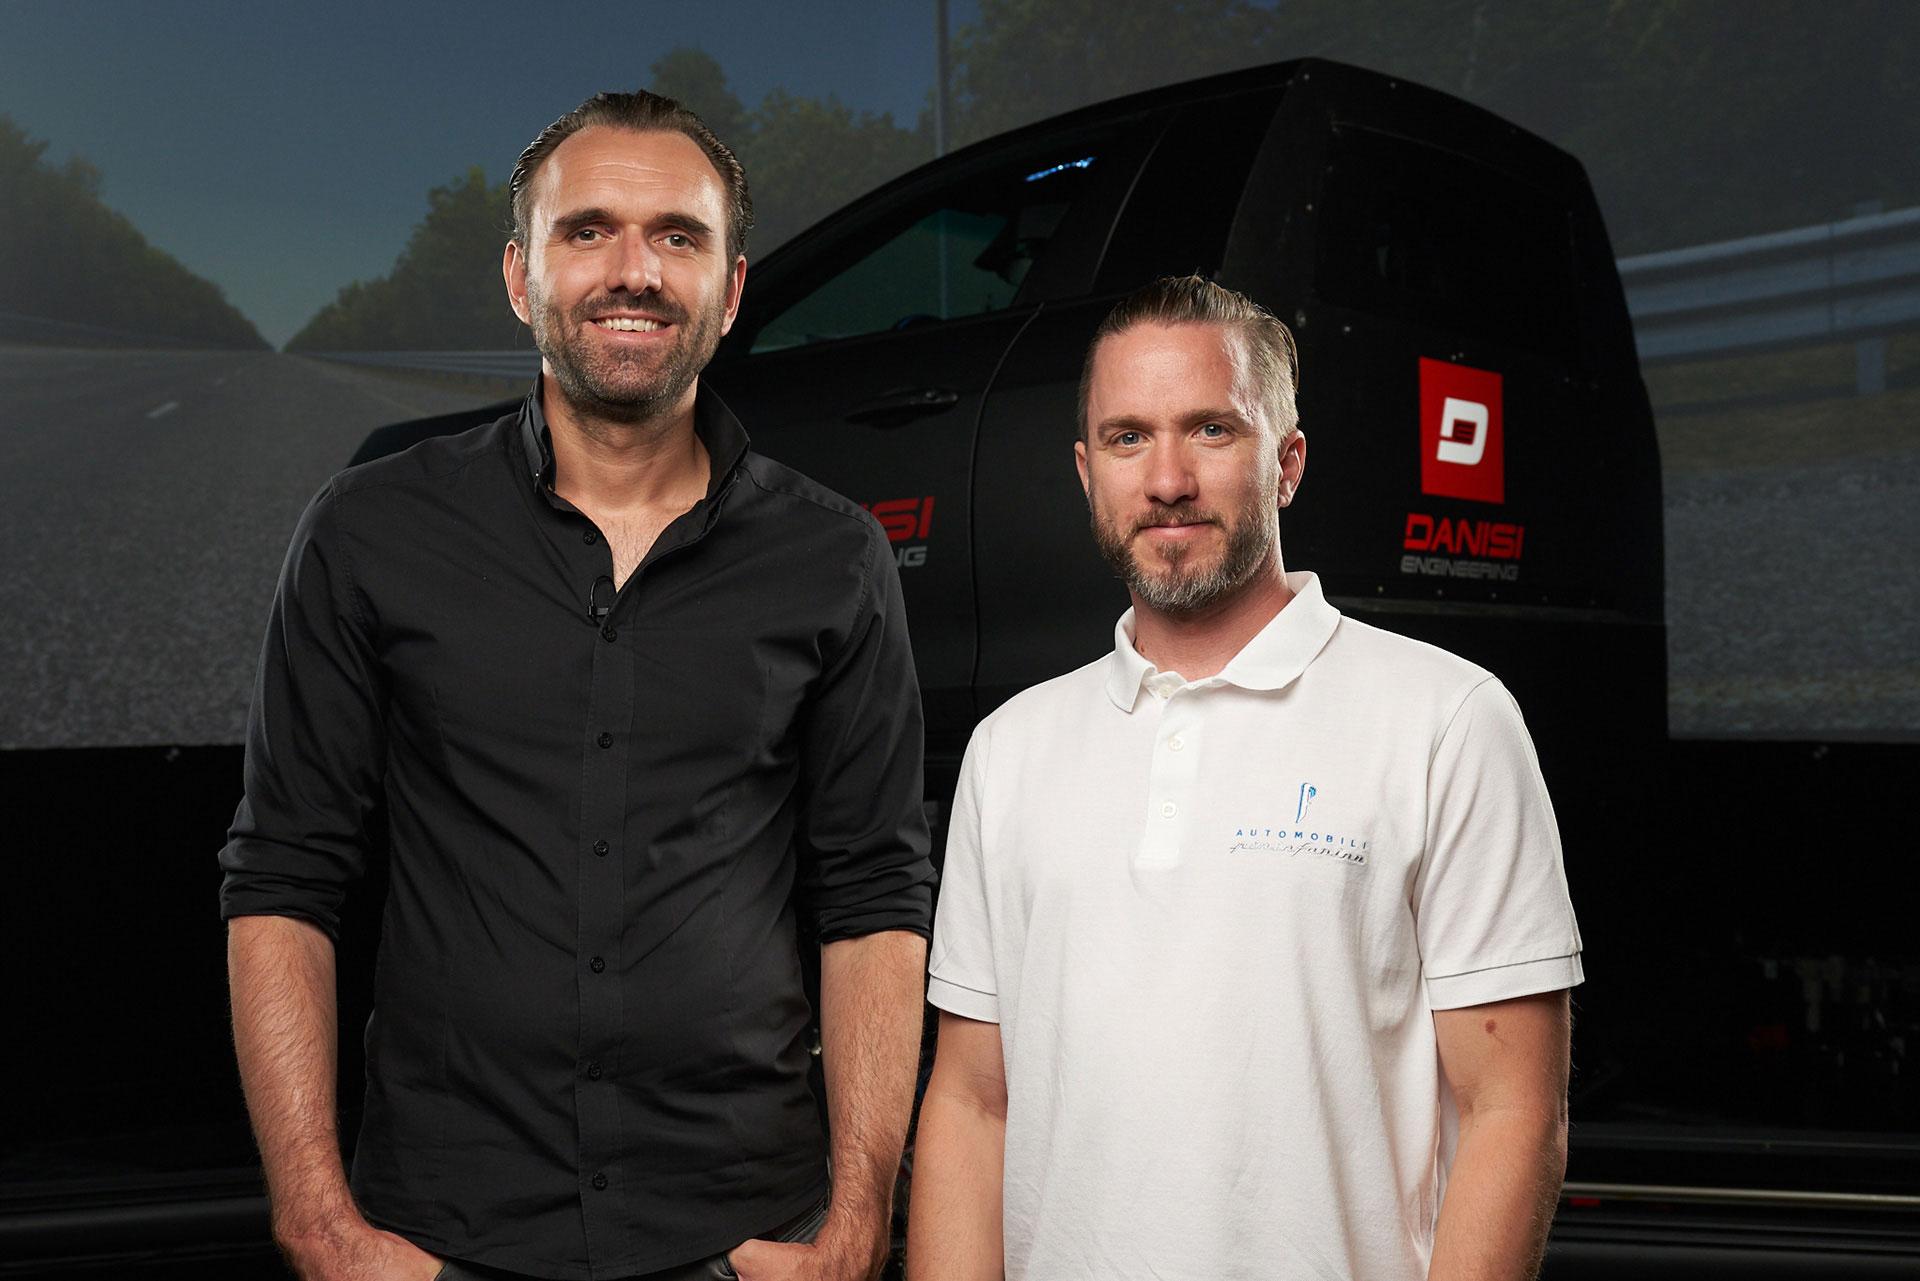 Rene Wollmann and Nick Heidfeld